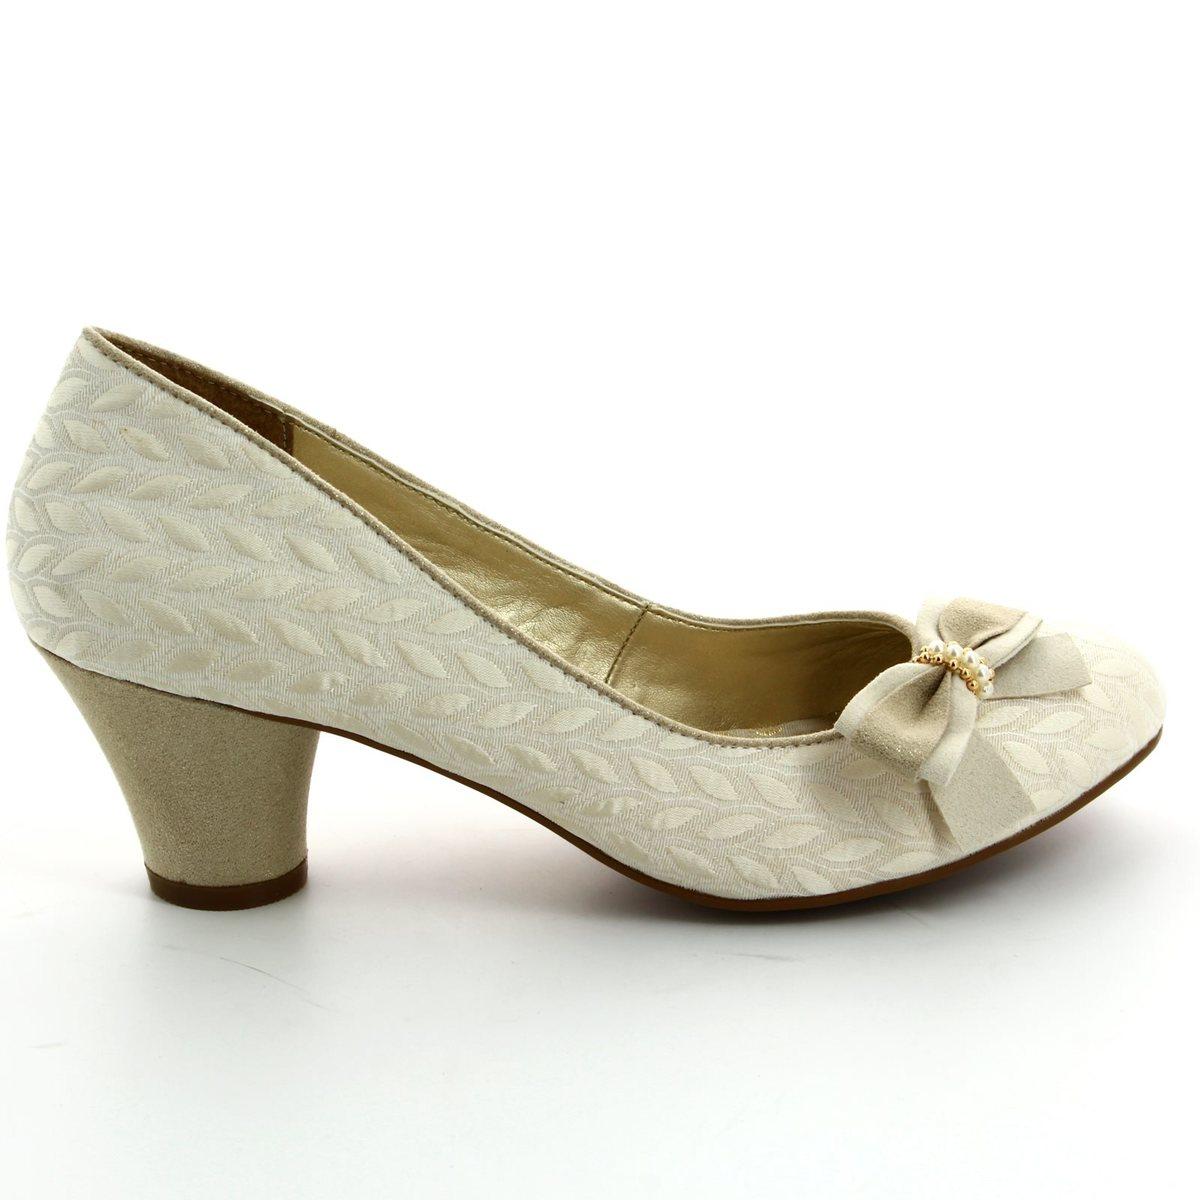 0655c04333f74 Ruby Shoo High-heeled Shoes - Cream - 09090/95 LILY